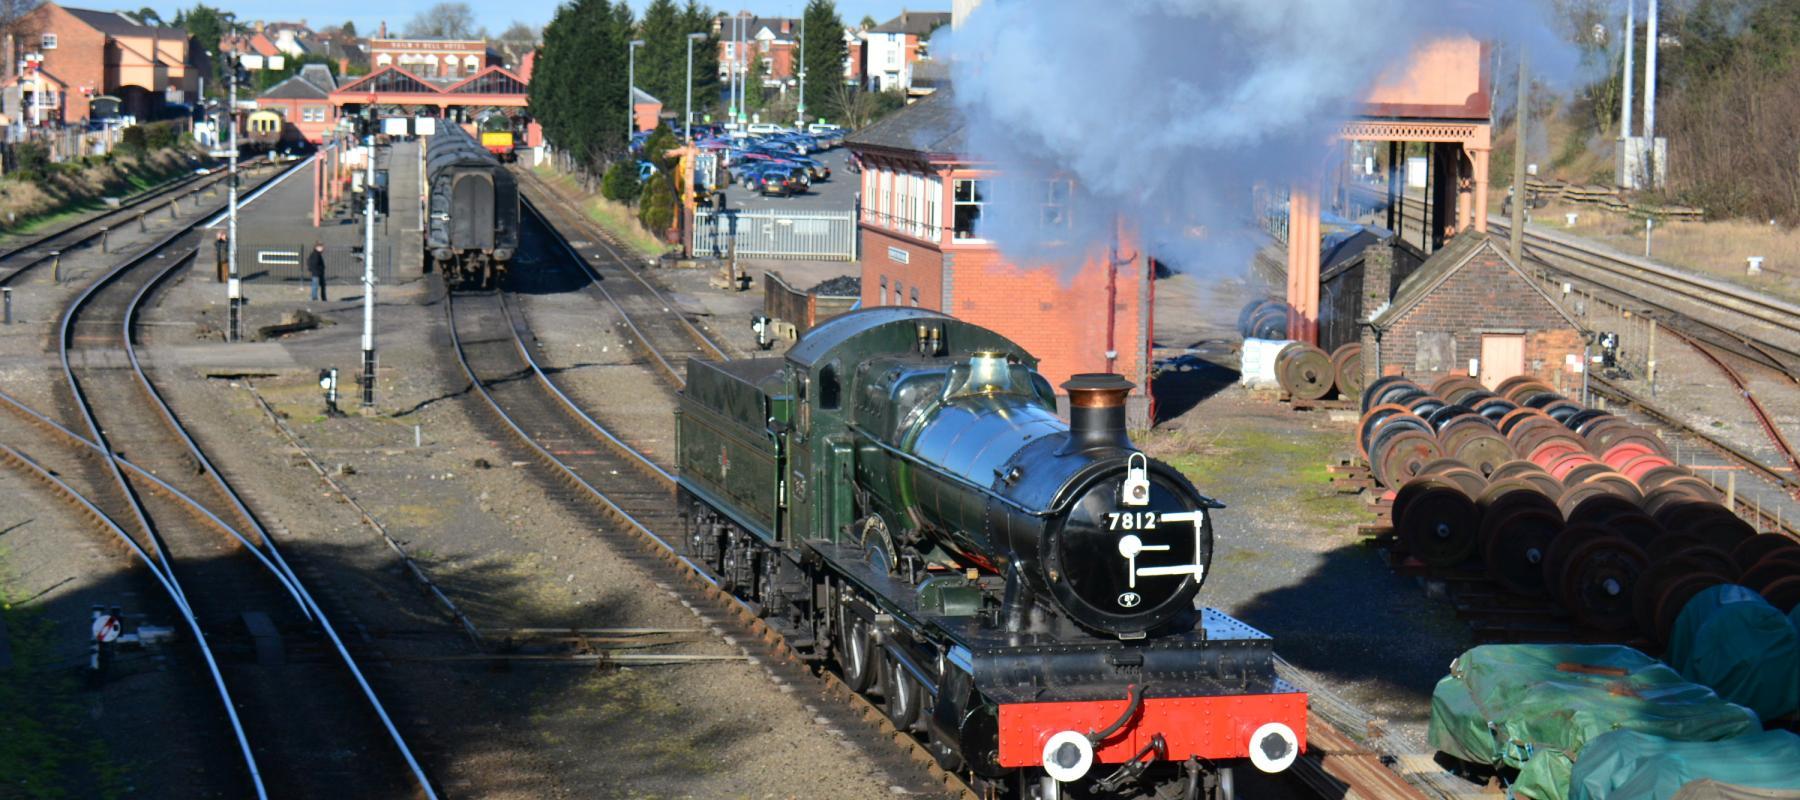 Kidderminster Station & Severn Valley Railway